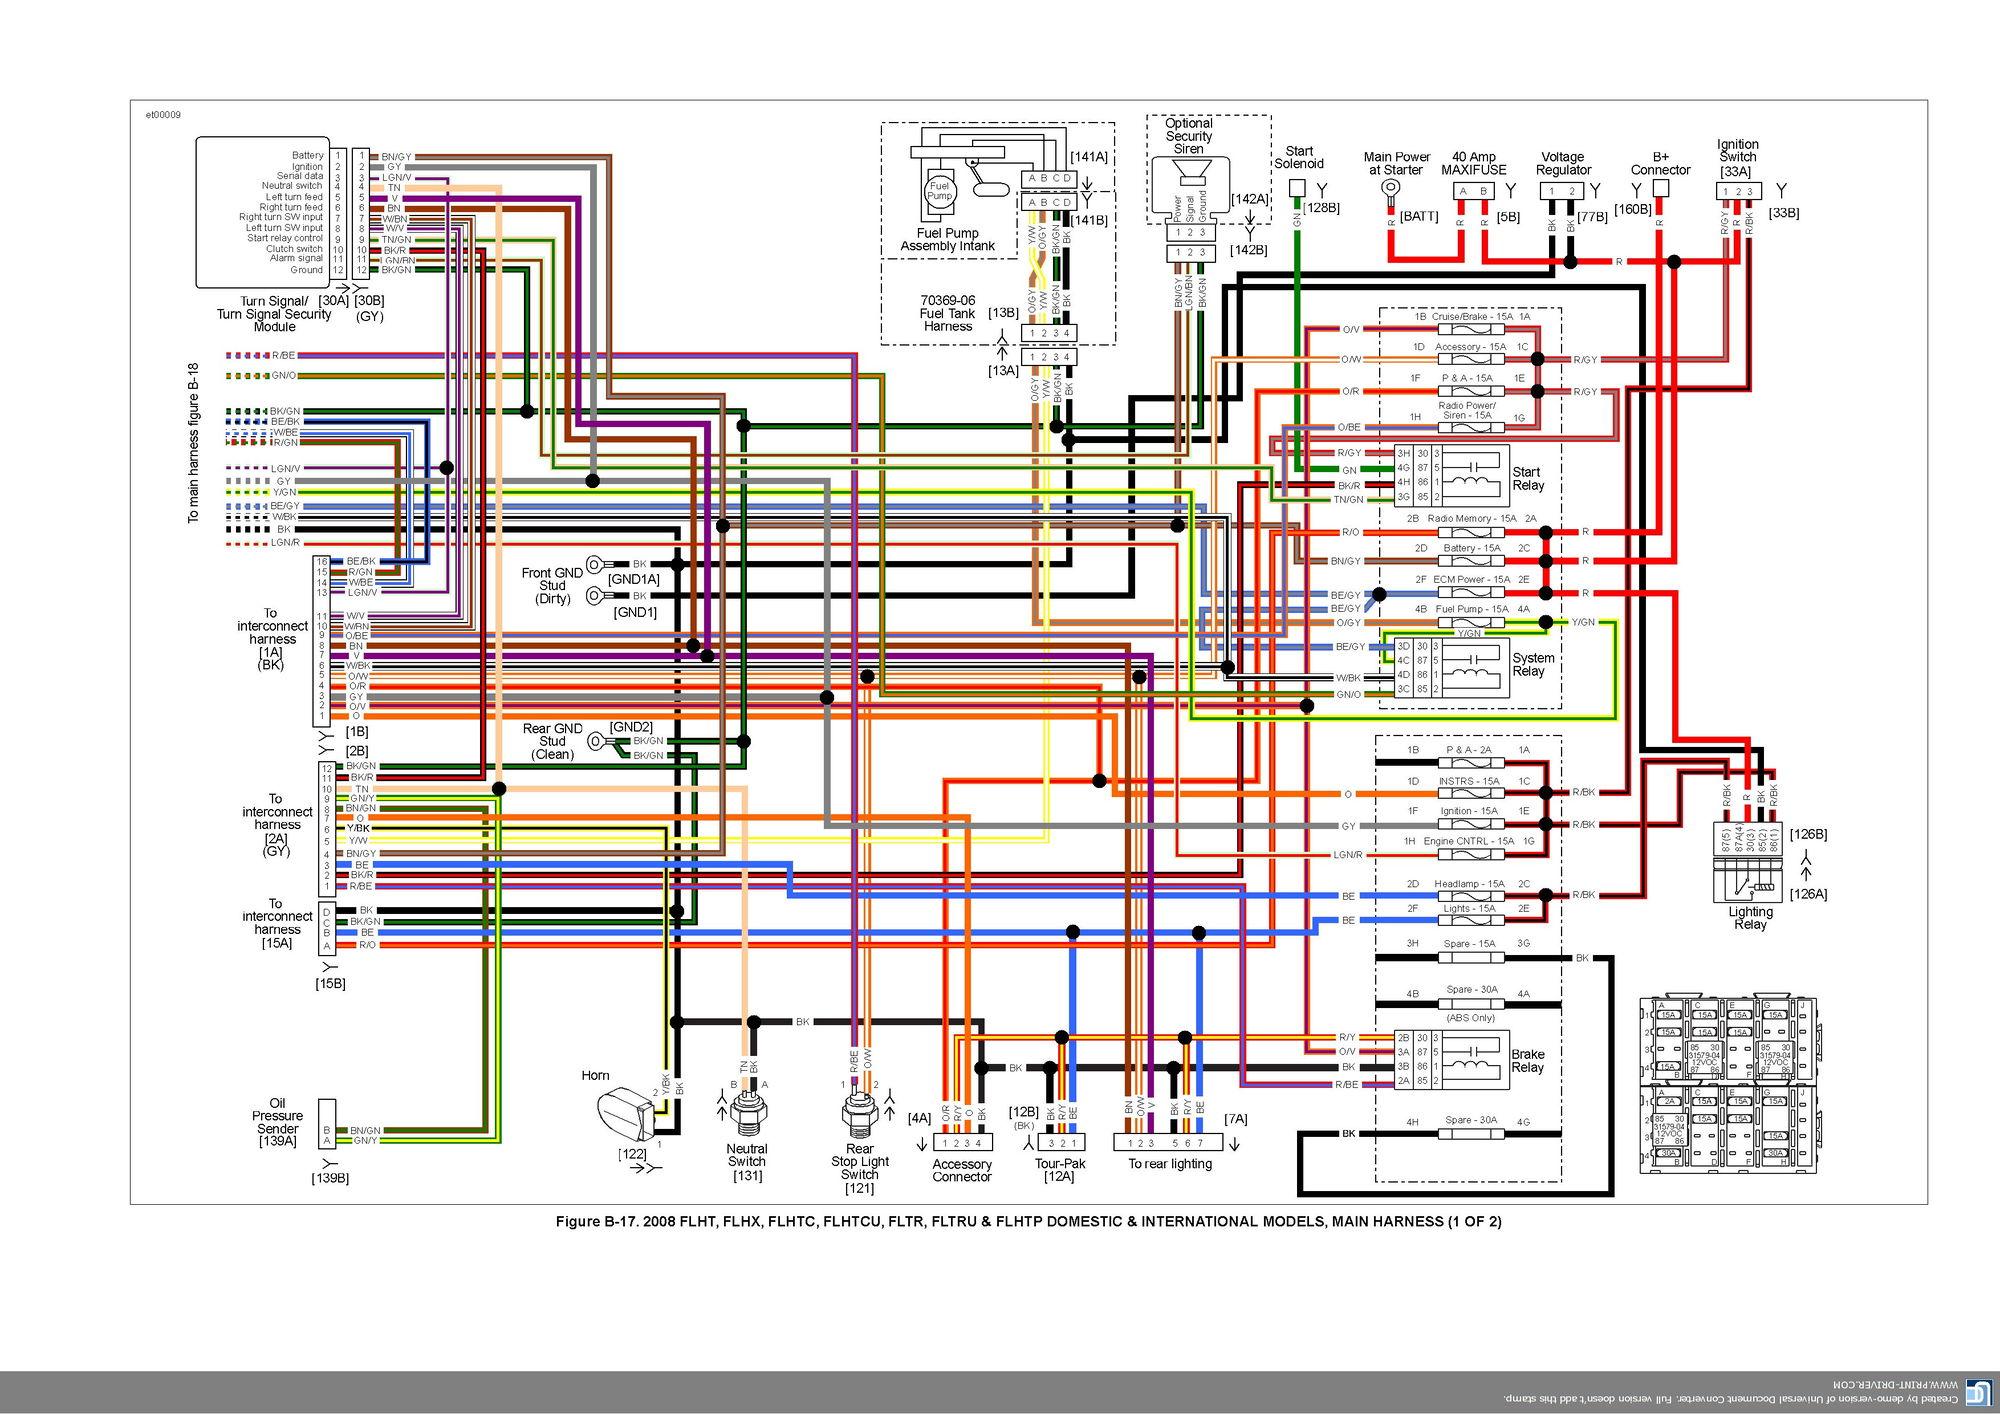 hight resolution of 2008 harley davidson flhx wiring diagram trusted wiring diagram fxef wiring diagram 08 flhx wiring diagram